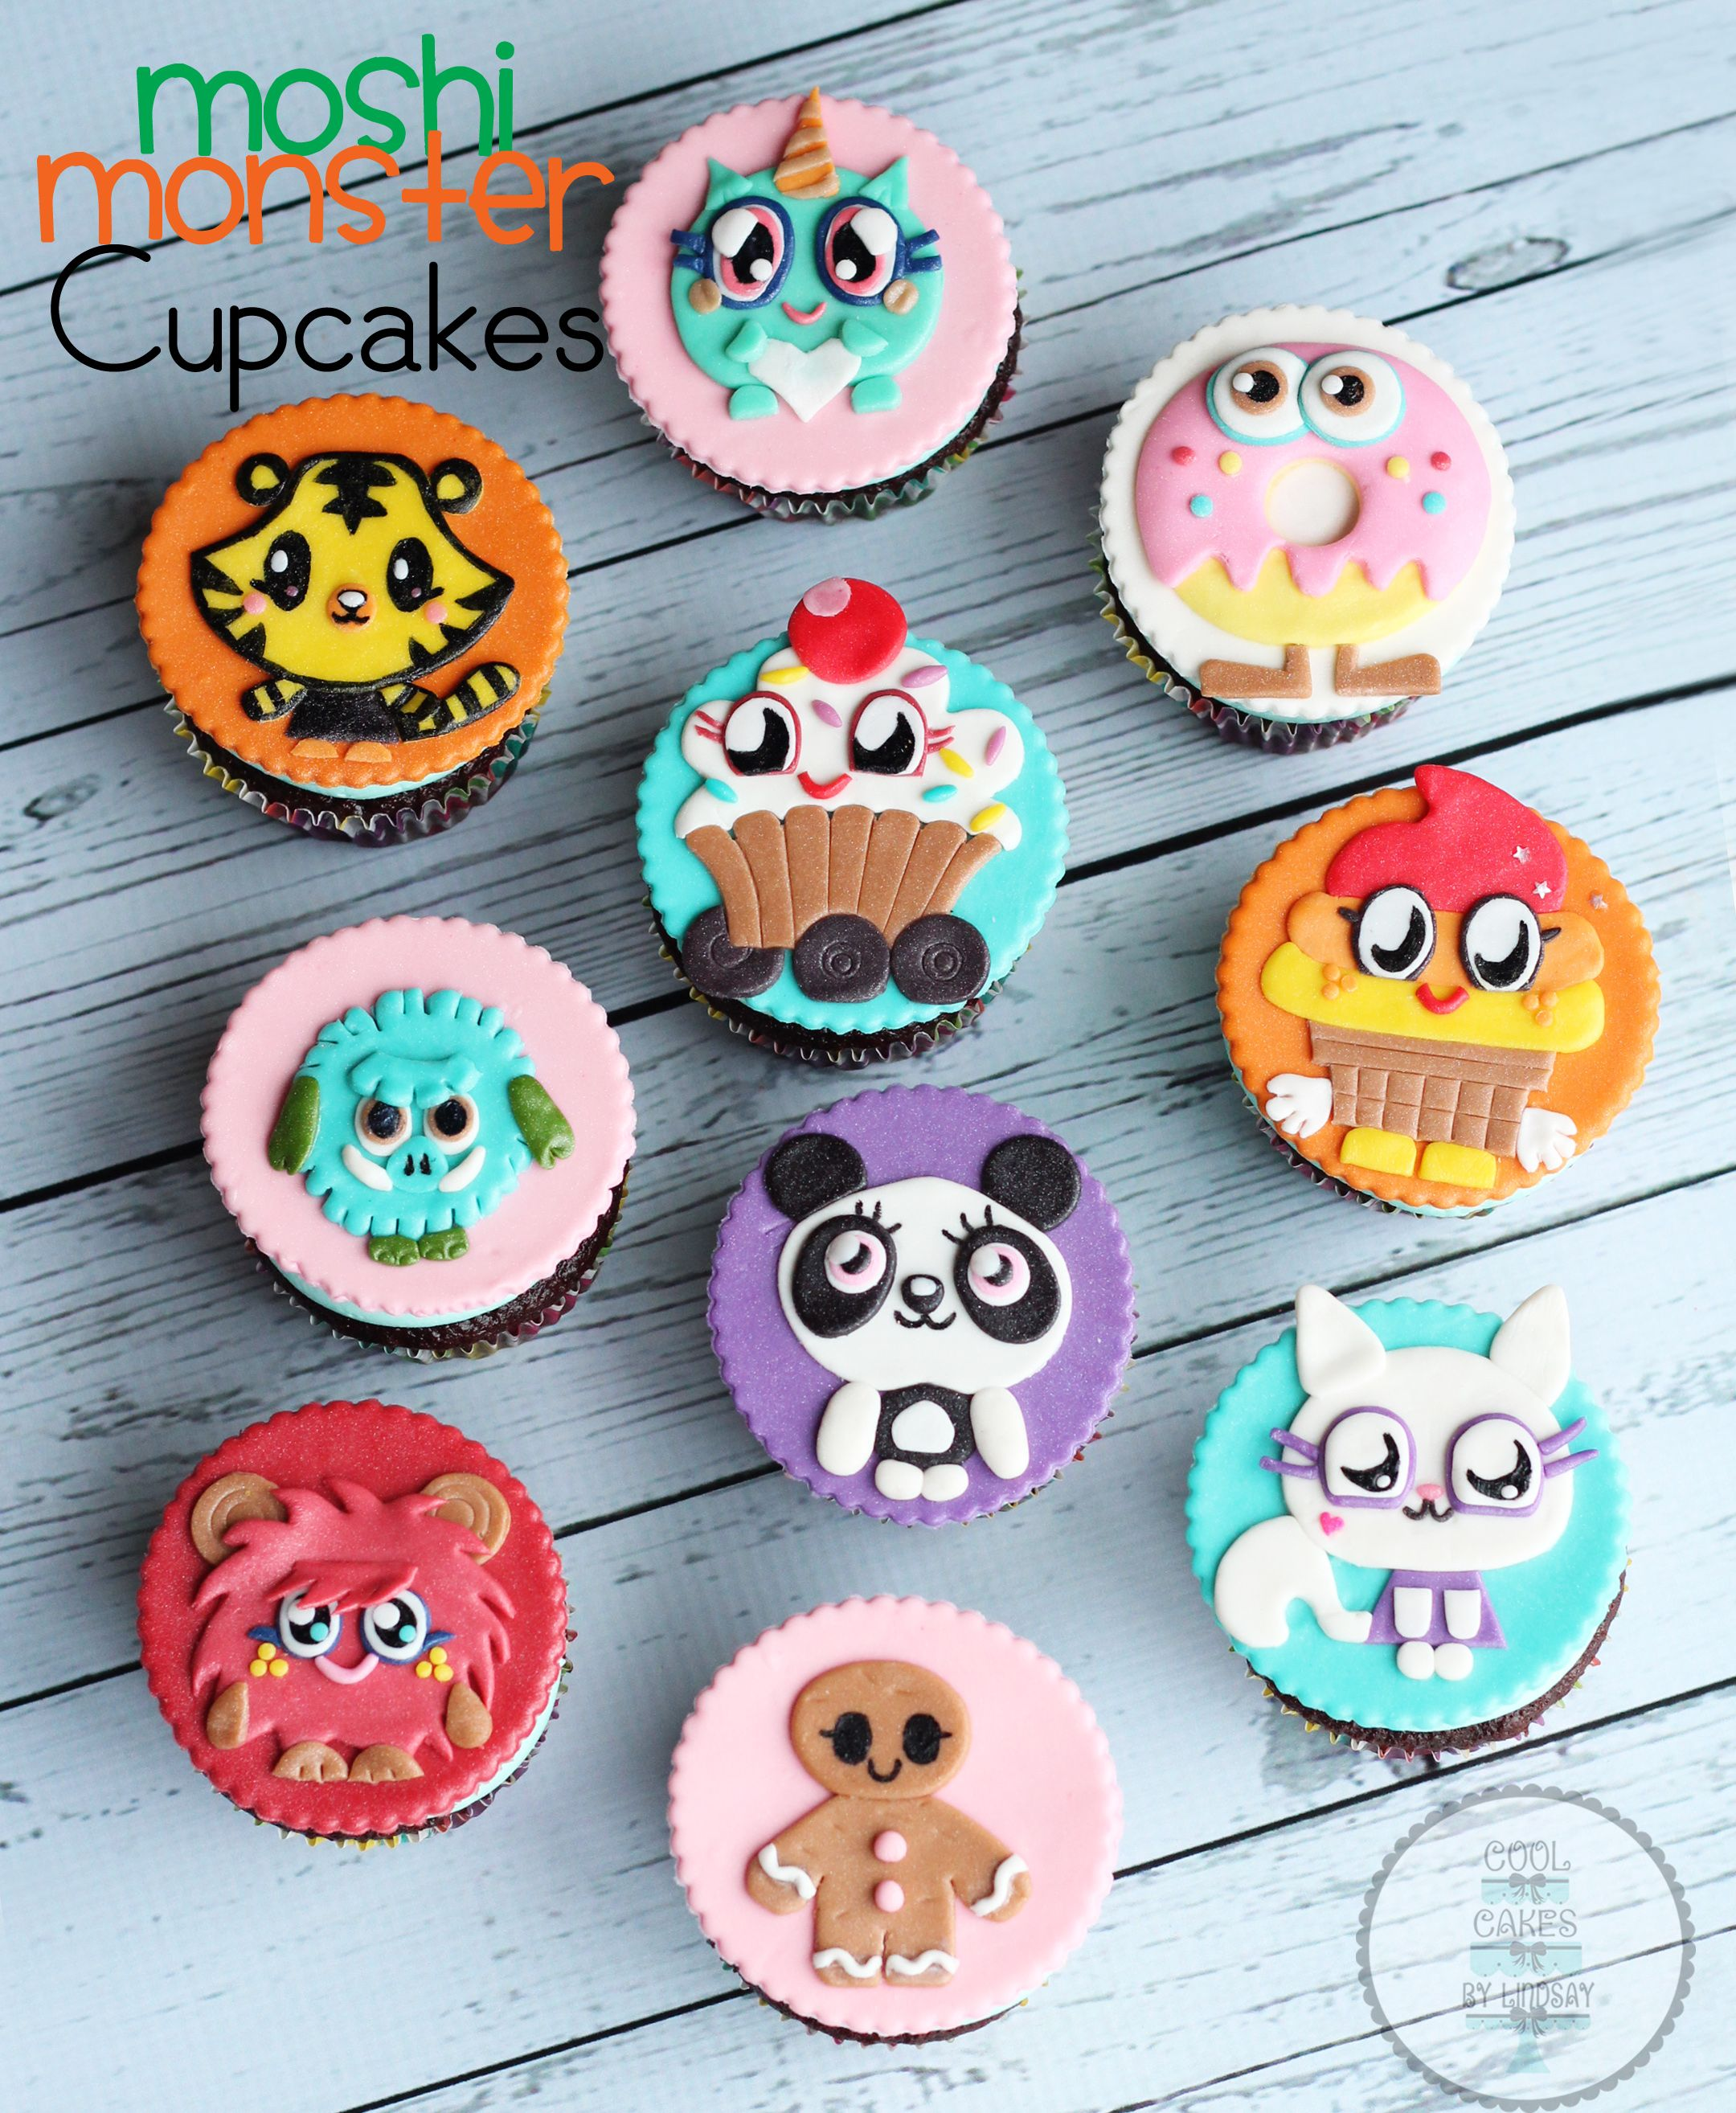 Moshi Monster Cupcakes!!!